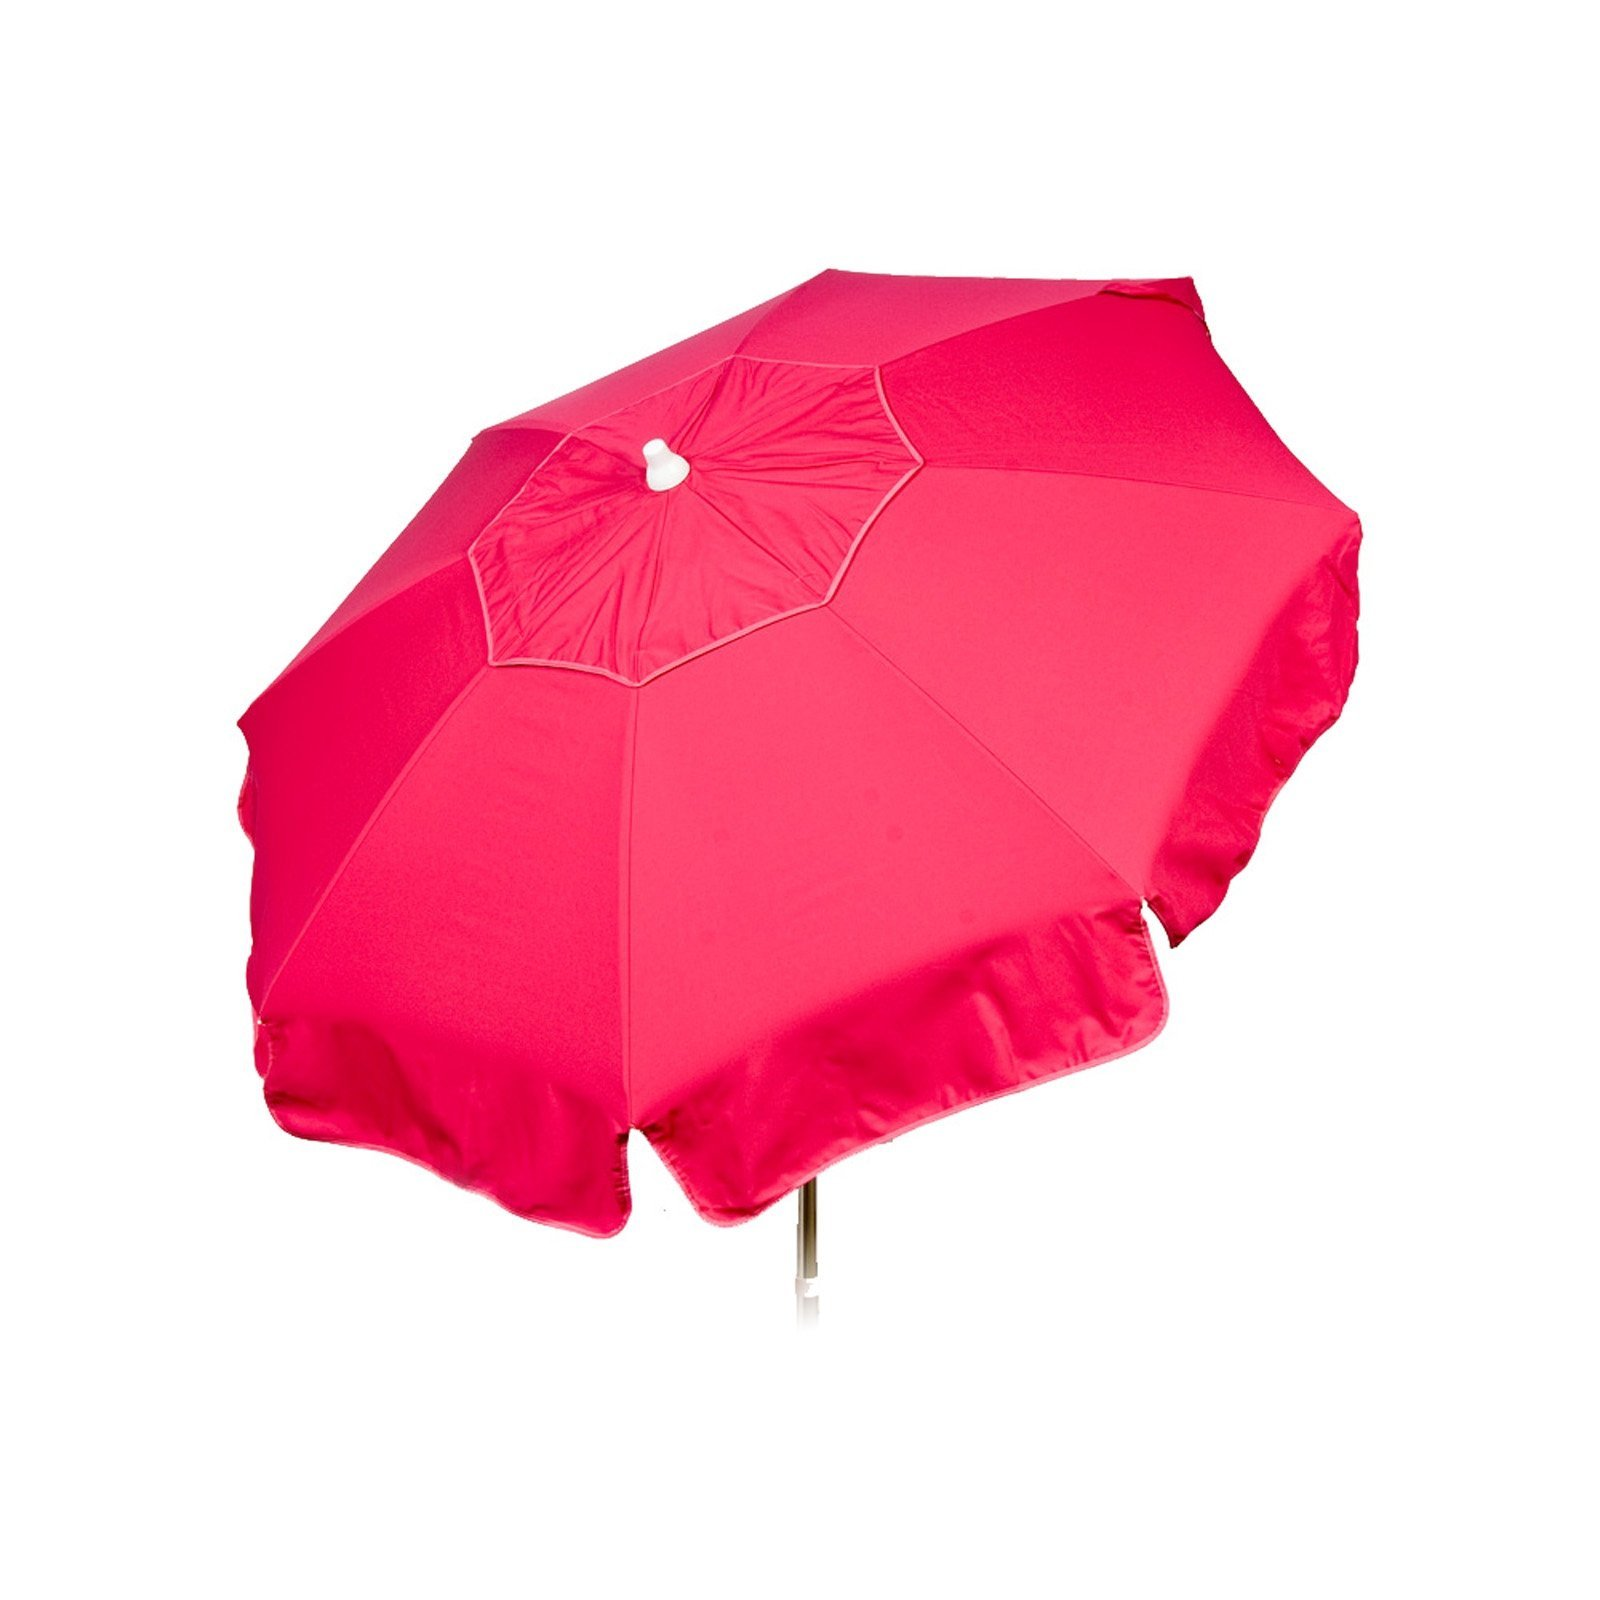 Italian 6 foot Push/Tilt Umbrella Acrylic Solid Fuchsia - Patio Pole